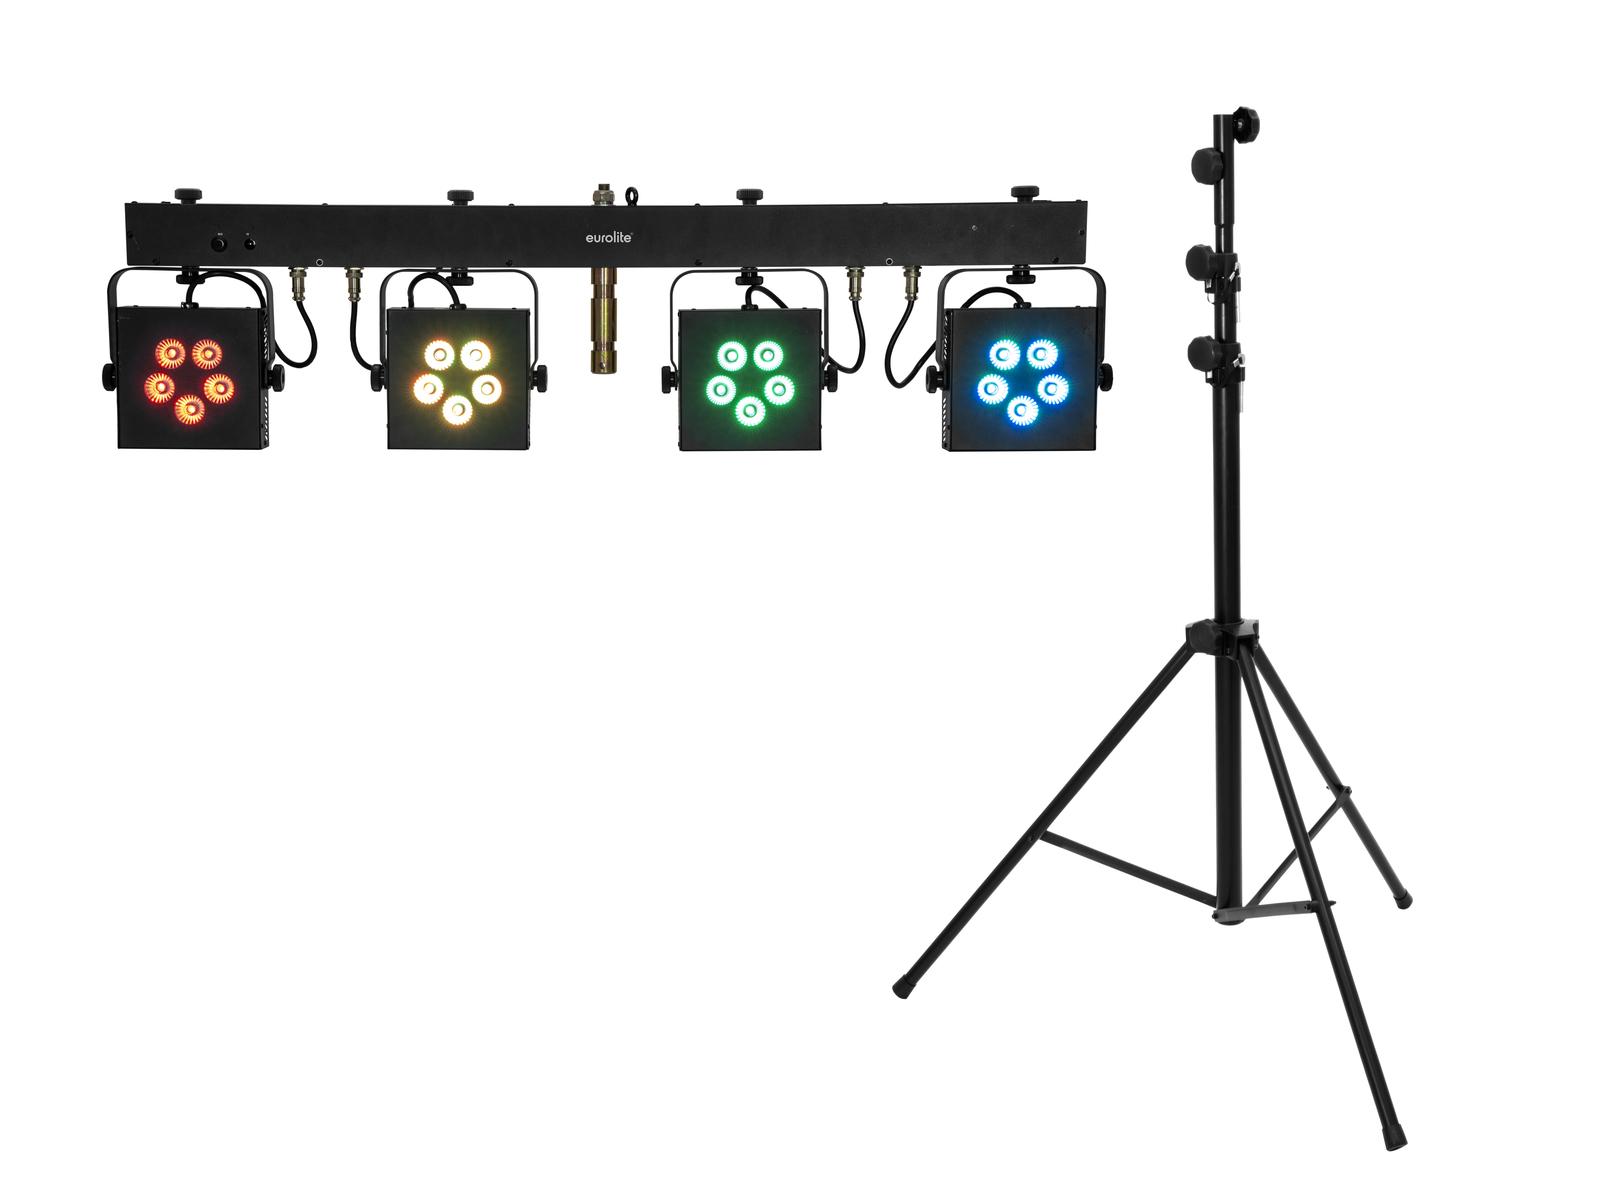 EUROLITE Set LED KLS-902 + STV-60-WOT EU Stahlstativ schwarz